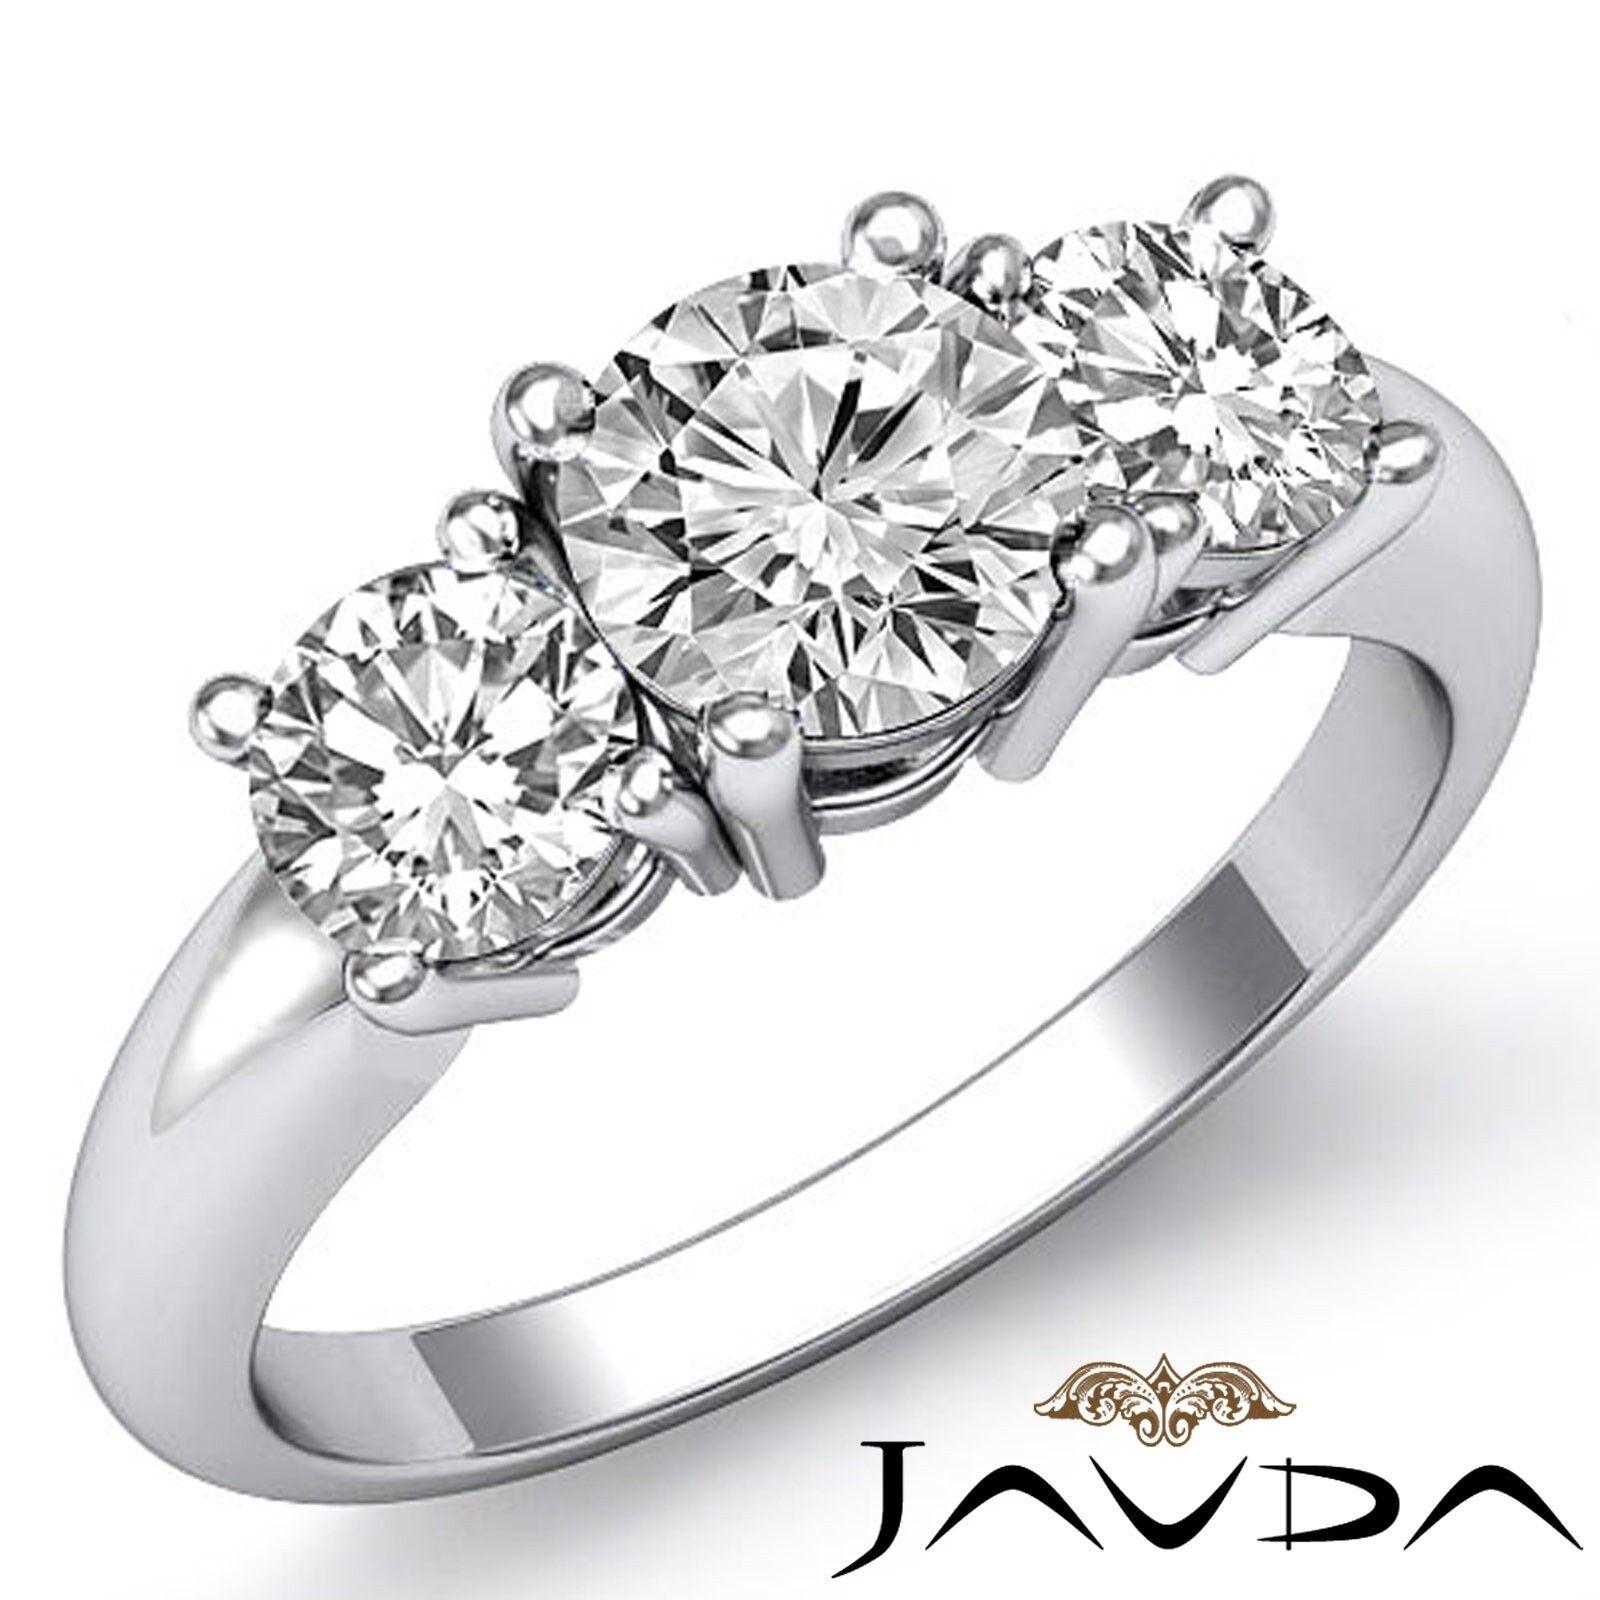 1.4ct Classic Three Stone Basket Round Diamond Engagement Ring GIA G-VVS1 W Gold